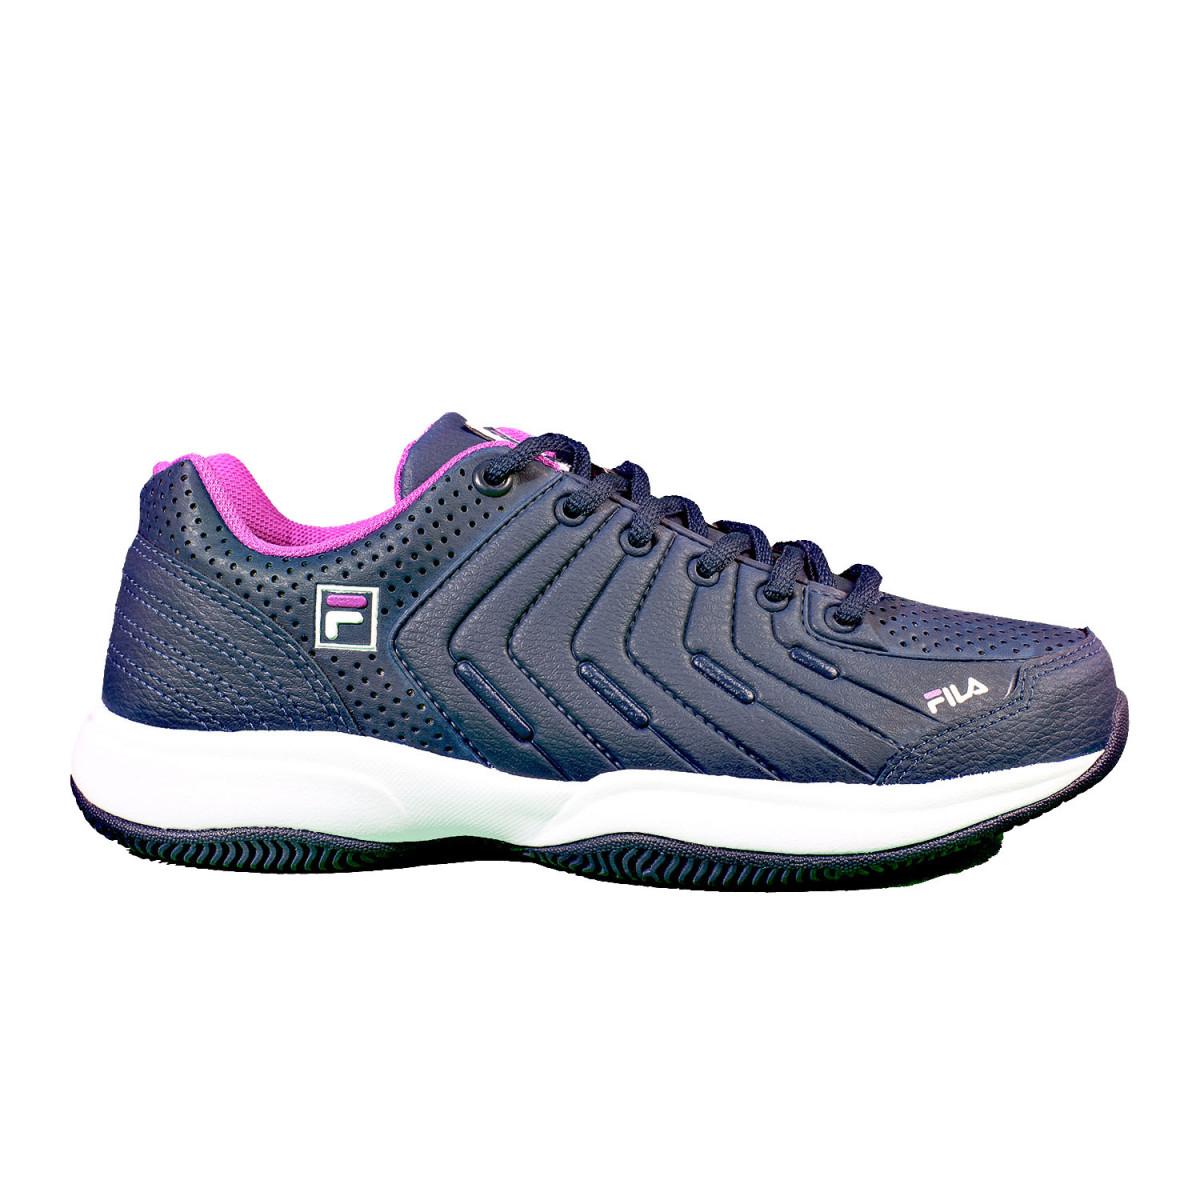 b997ada261 Zapatillas Fila Lugano 5.0 - Tenis - Zapatillas - Mujer